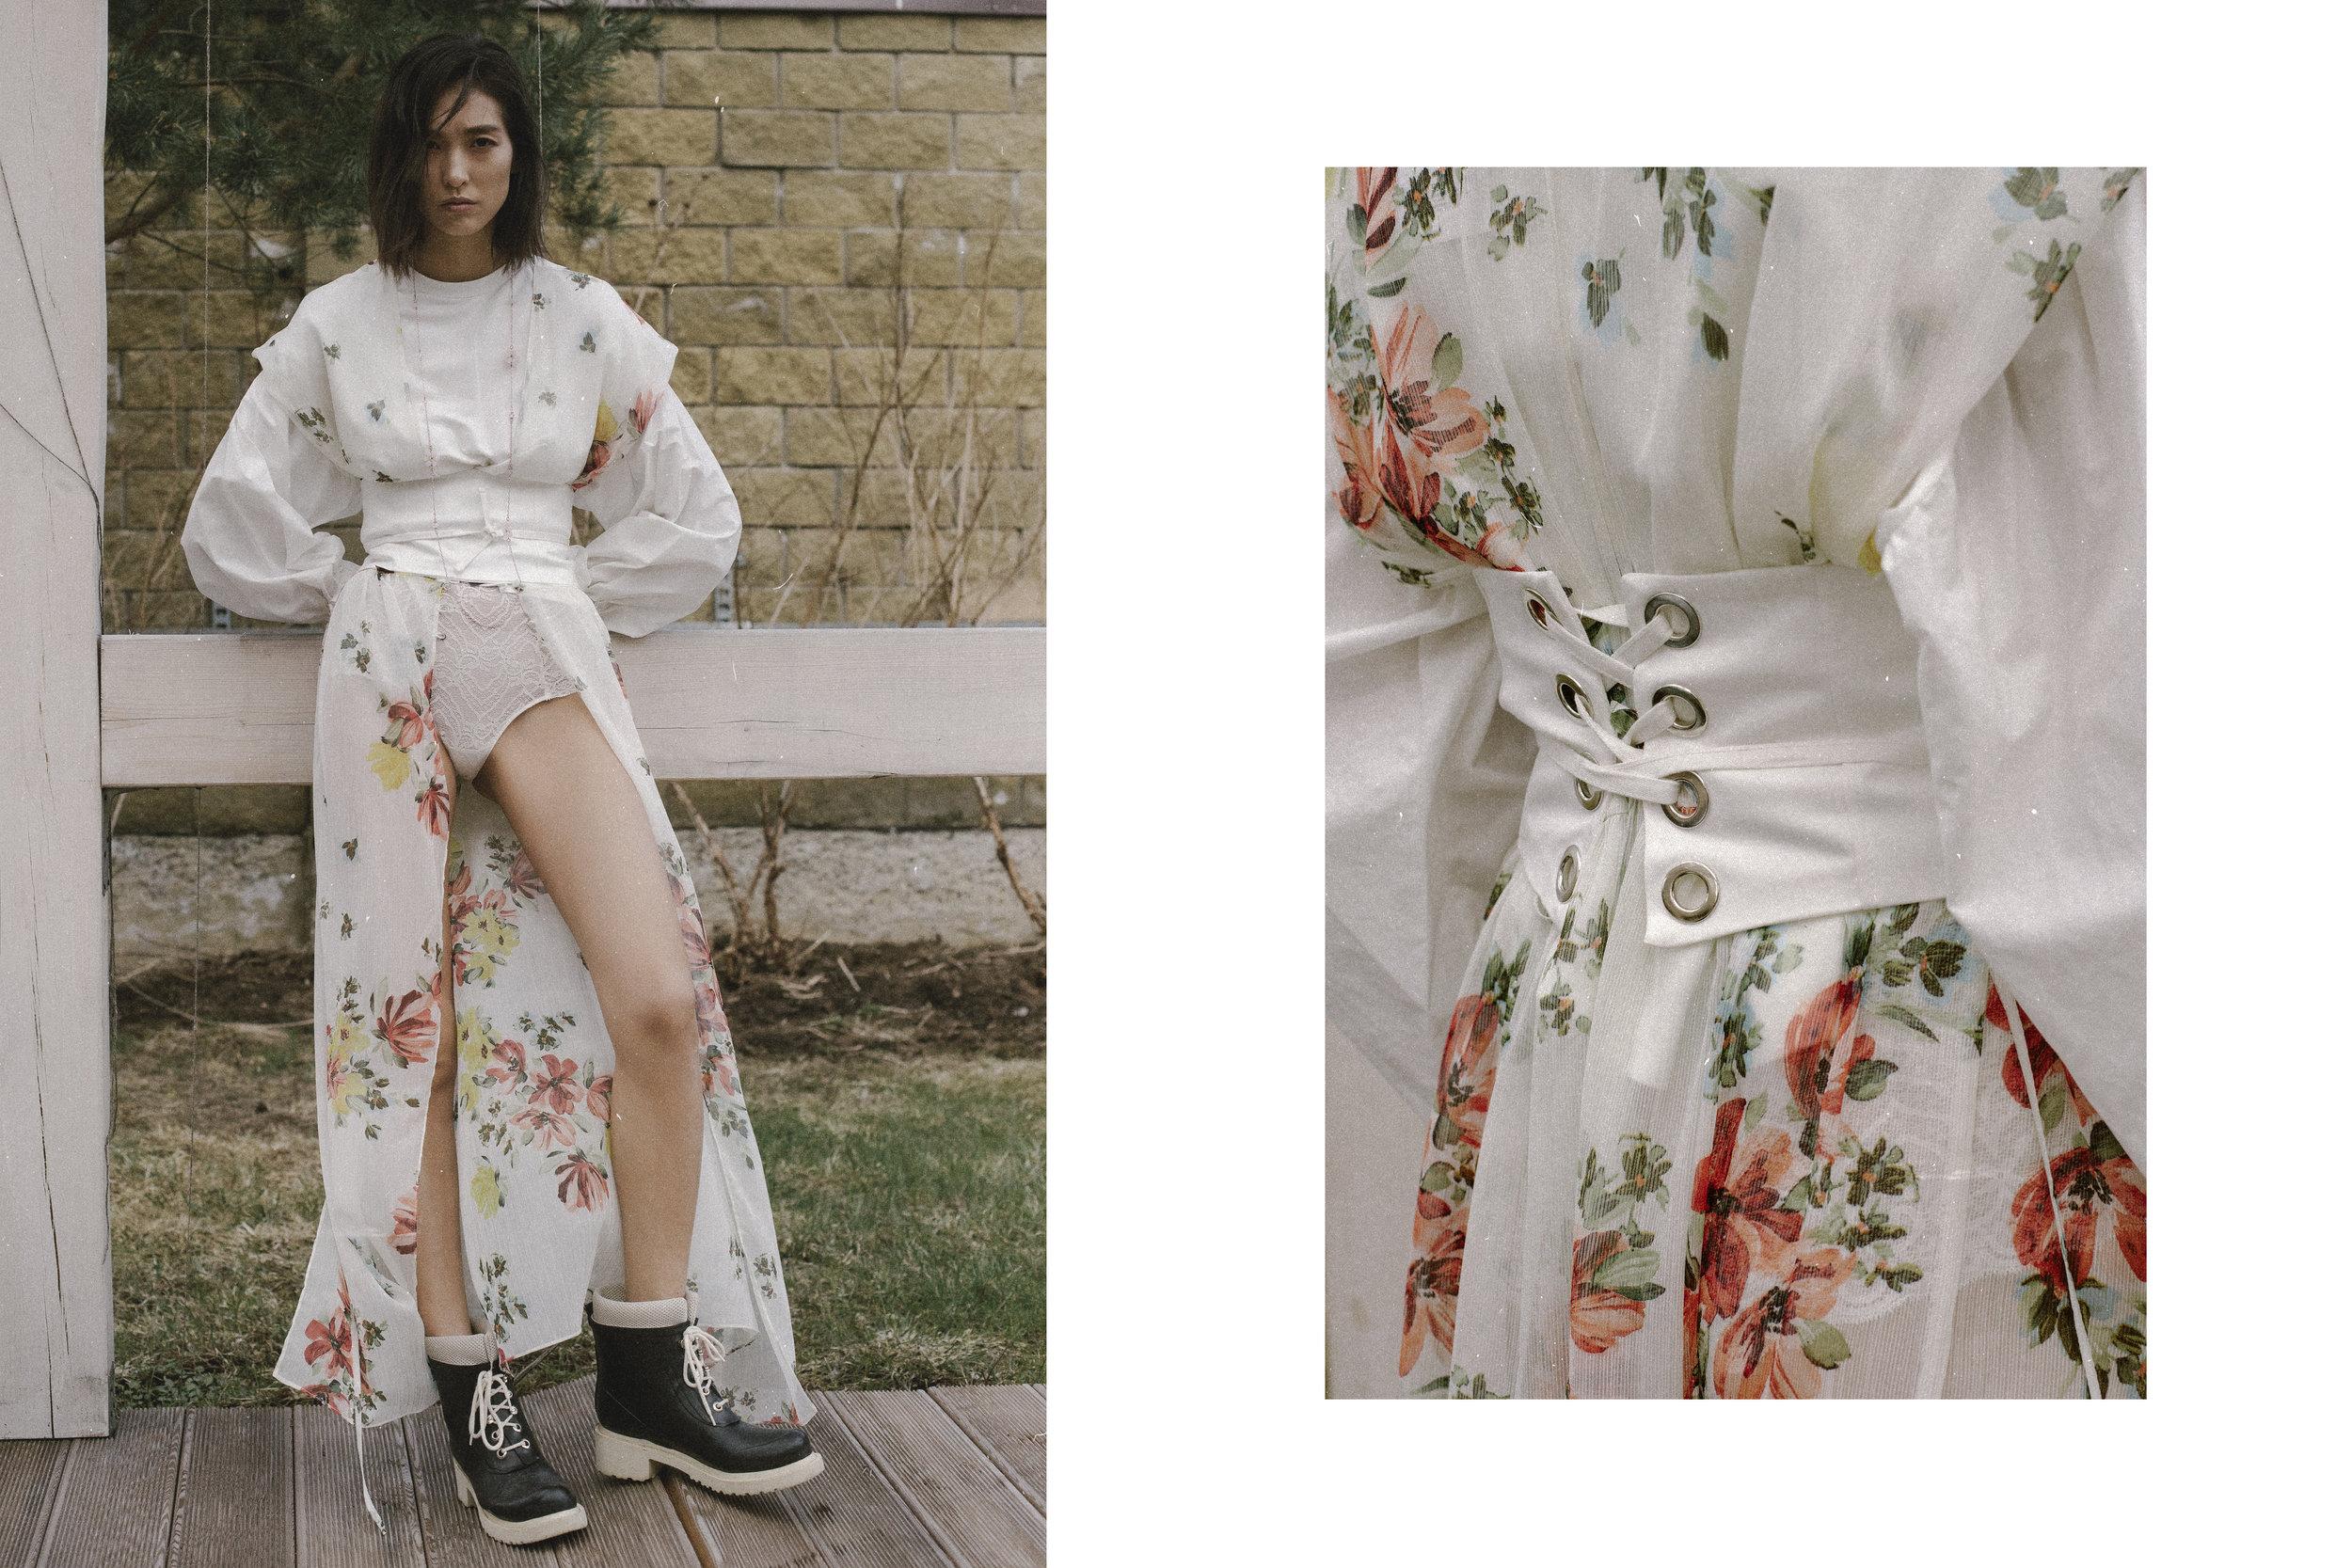 Top, dress, belt Zara, Cowards Intimissimi, Shoes Ilse Jacobsen, necklace of vintage, sandals Zara